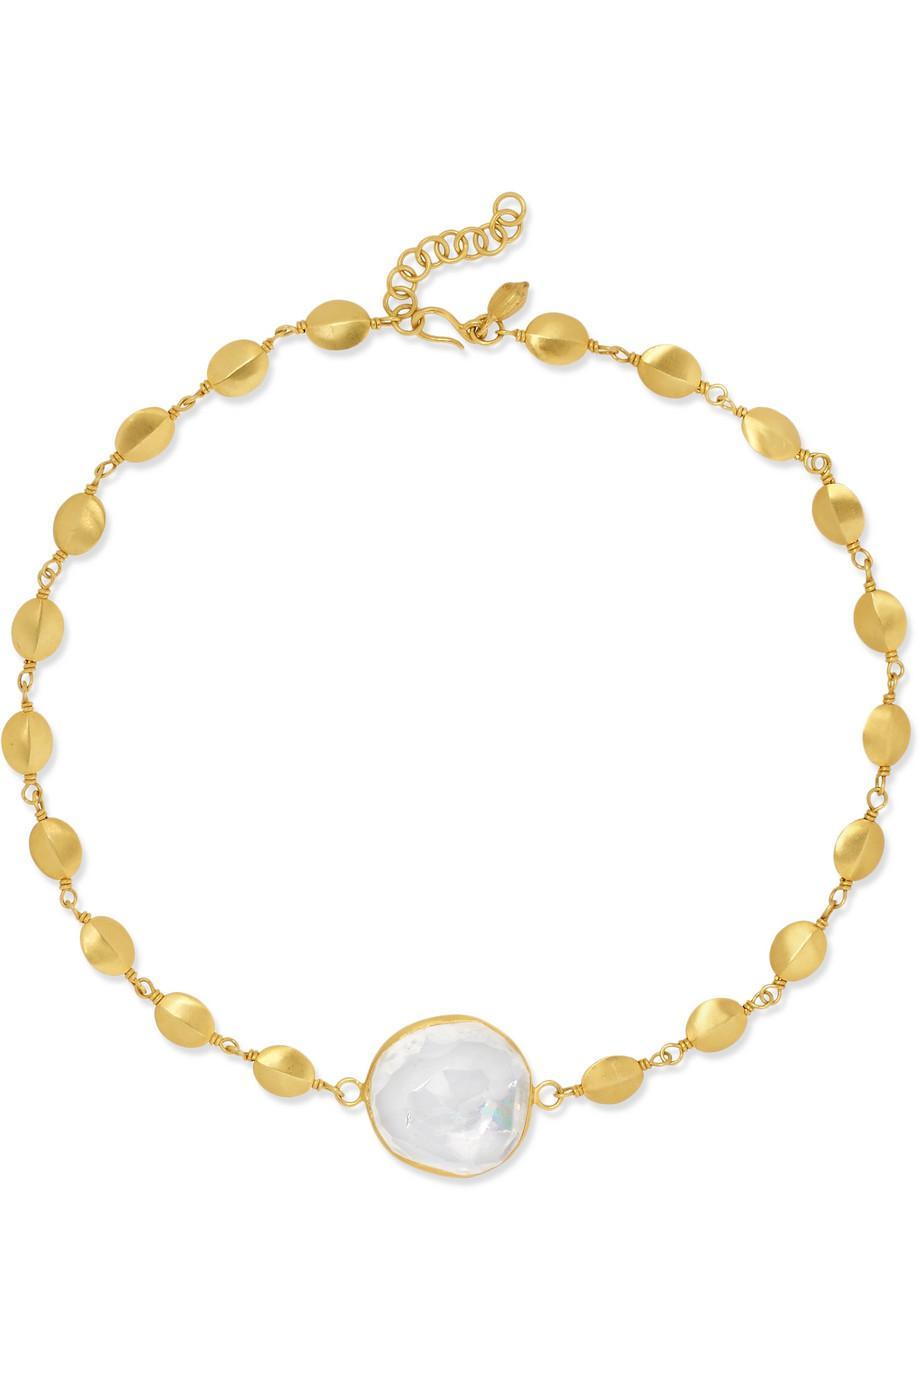 Pippa Small 18-karat Gold Crystal Choker qWOBUg5